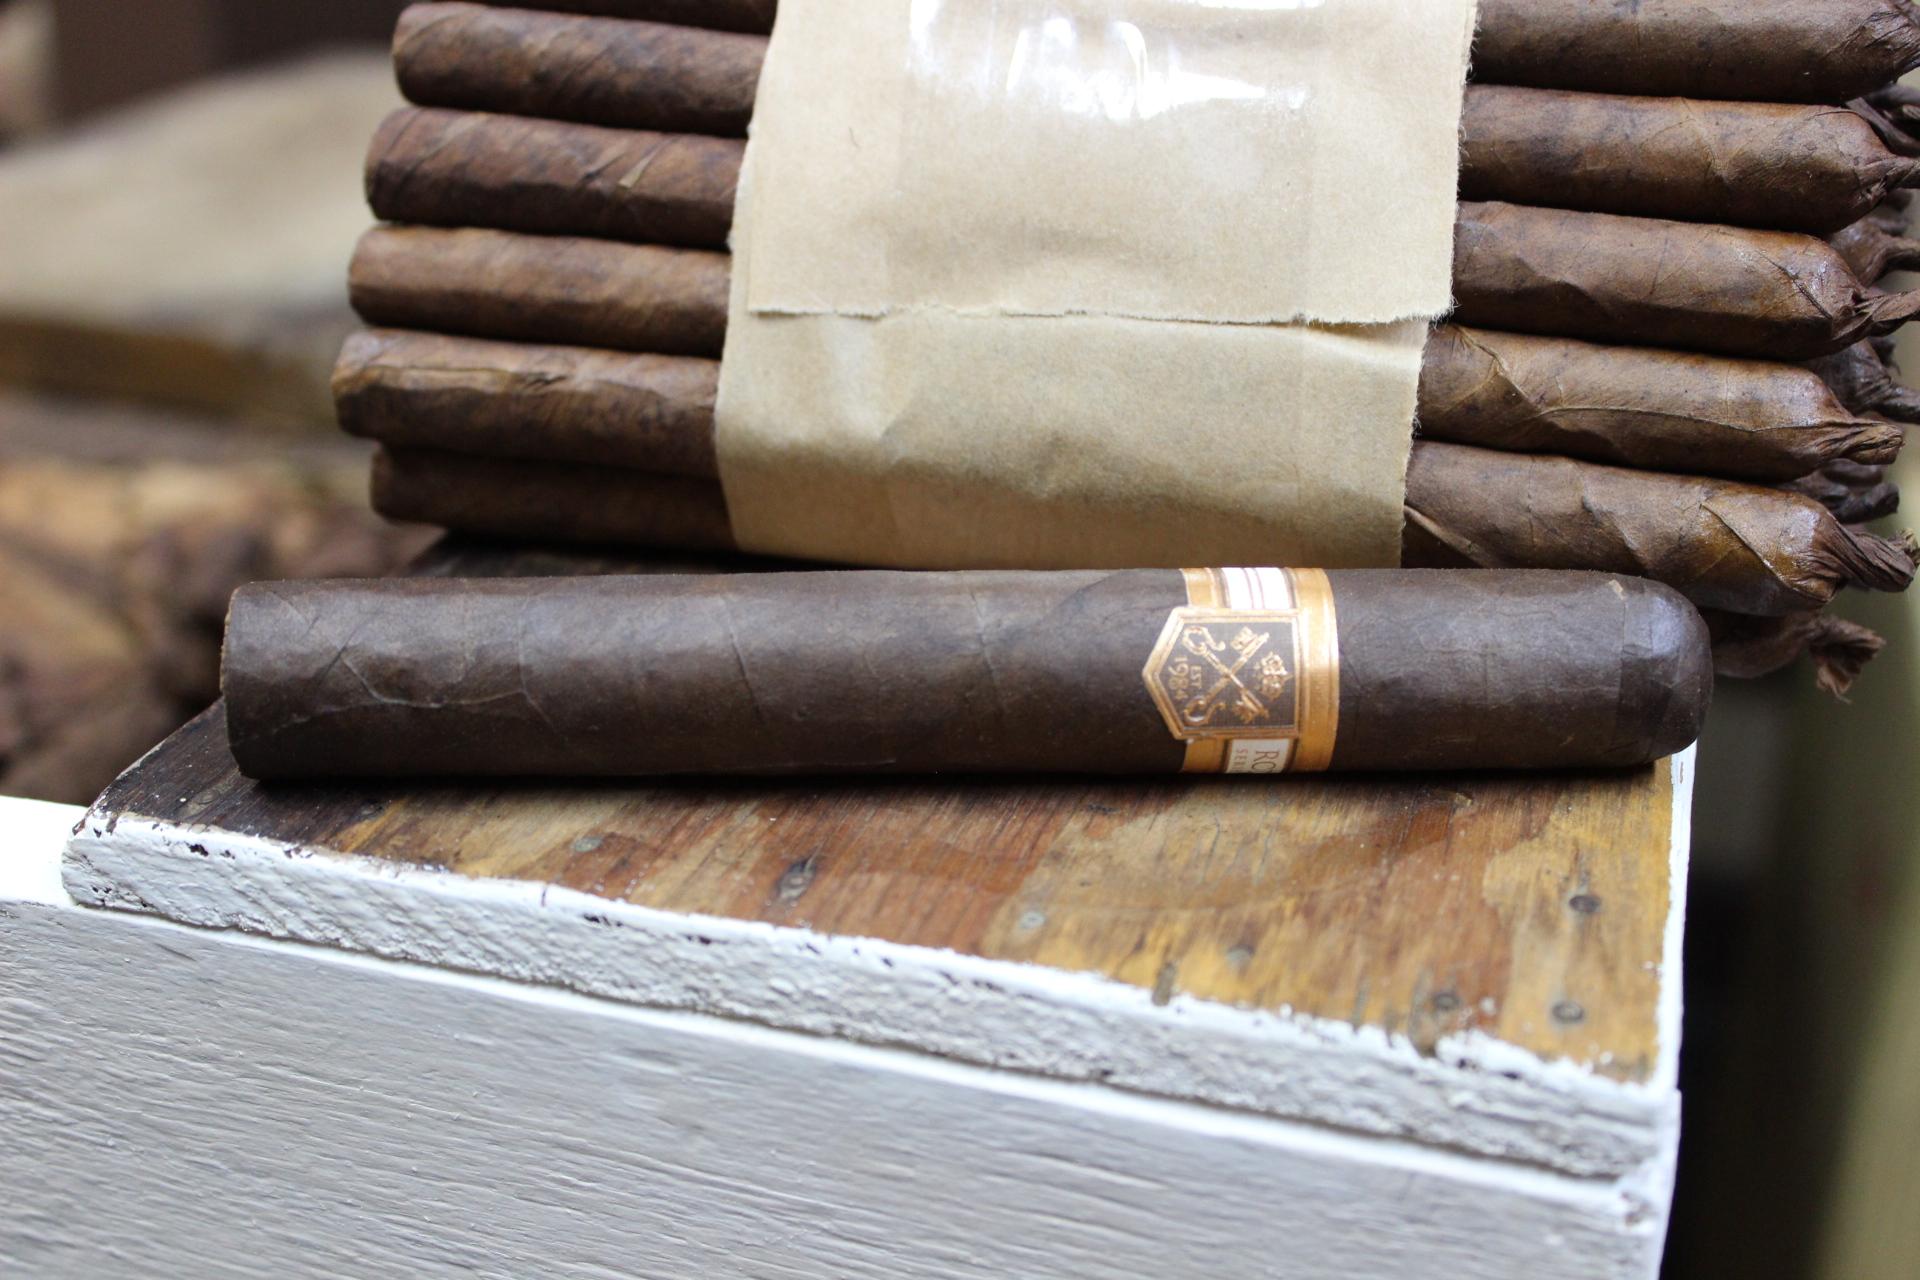 Rodriguez Cigars – Series 84 Maduro – Cigar Review – Stogie